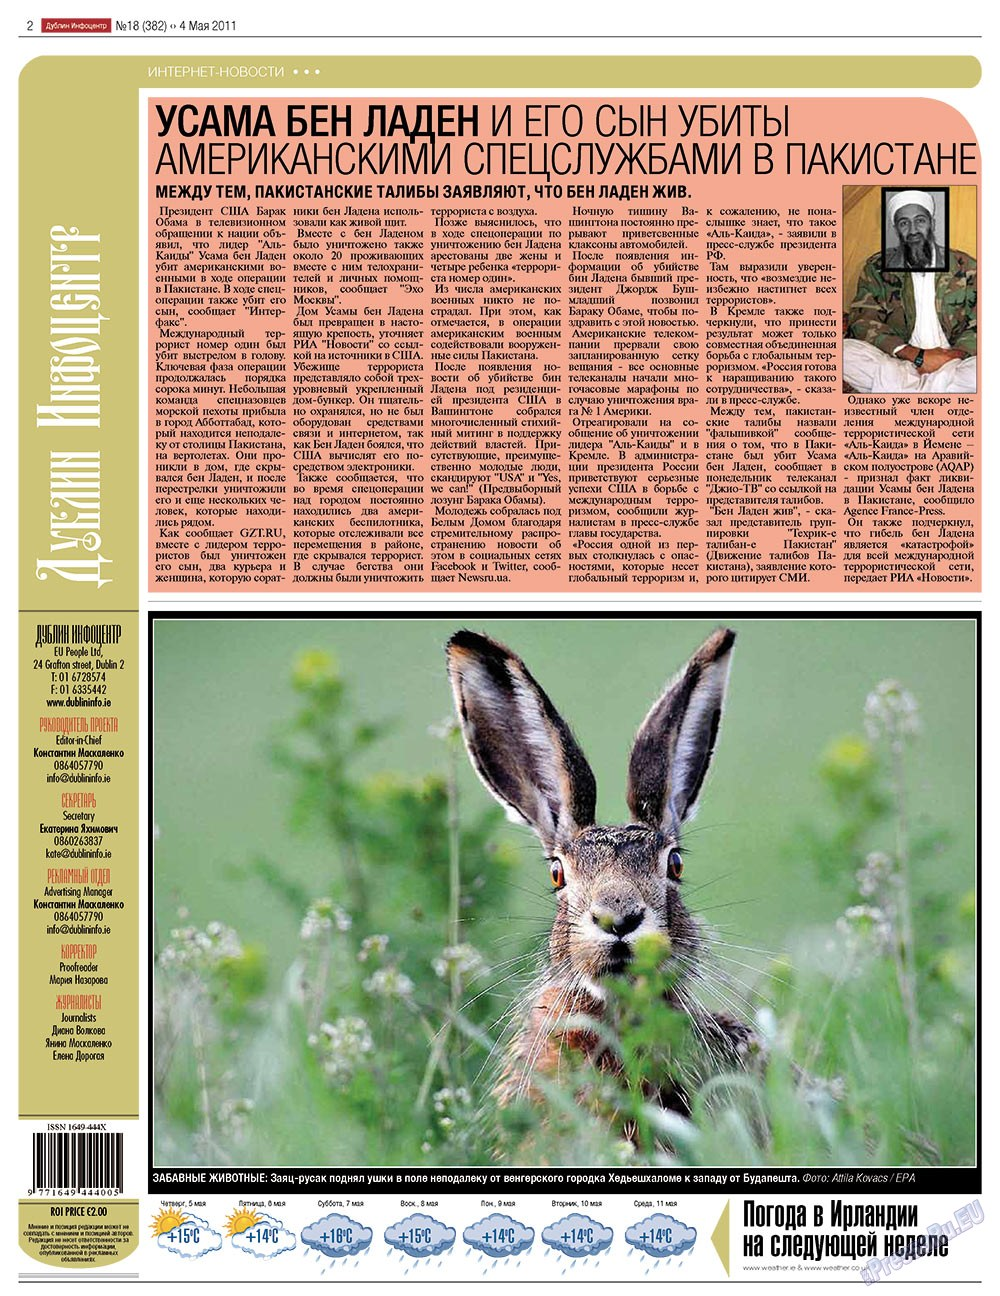 Дублин инфоцентр (газета). 2011 год, номер 18, стр. 2